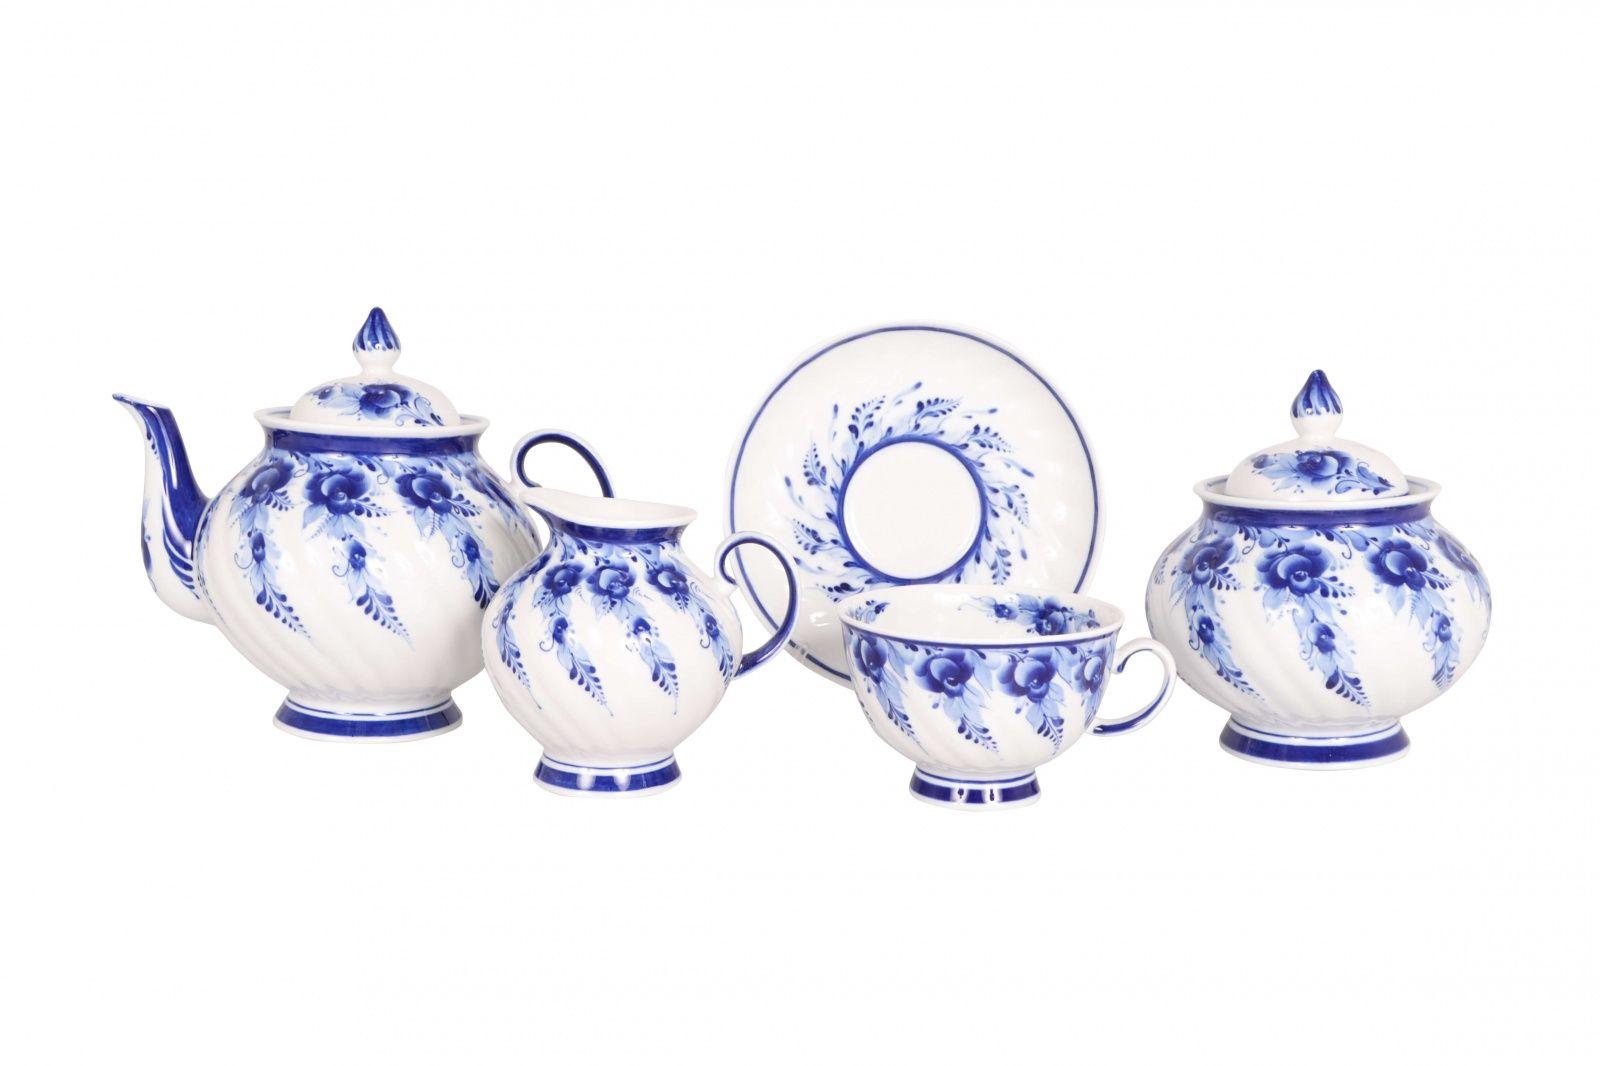 Dulevo porcelain / Tea set 15 pcs. Blue Rose